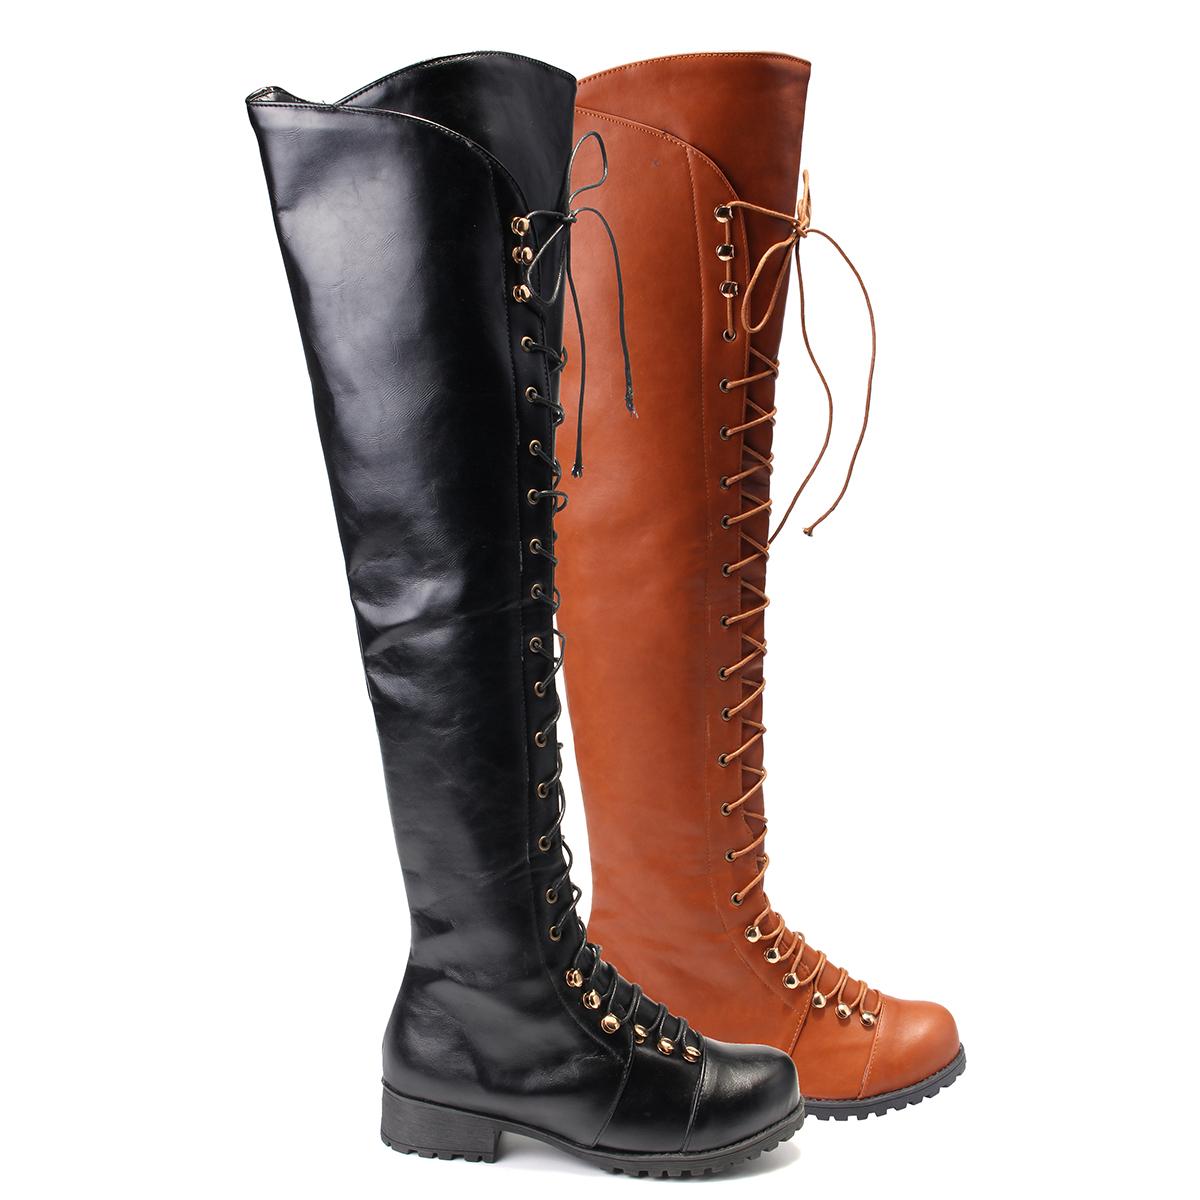 damen overkneestiefel stiefeletten schn r stiefel boots riemchen winterschuhe ebay. Black Bedroom Furniture Sets. Home Design Ideas